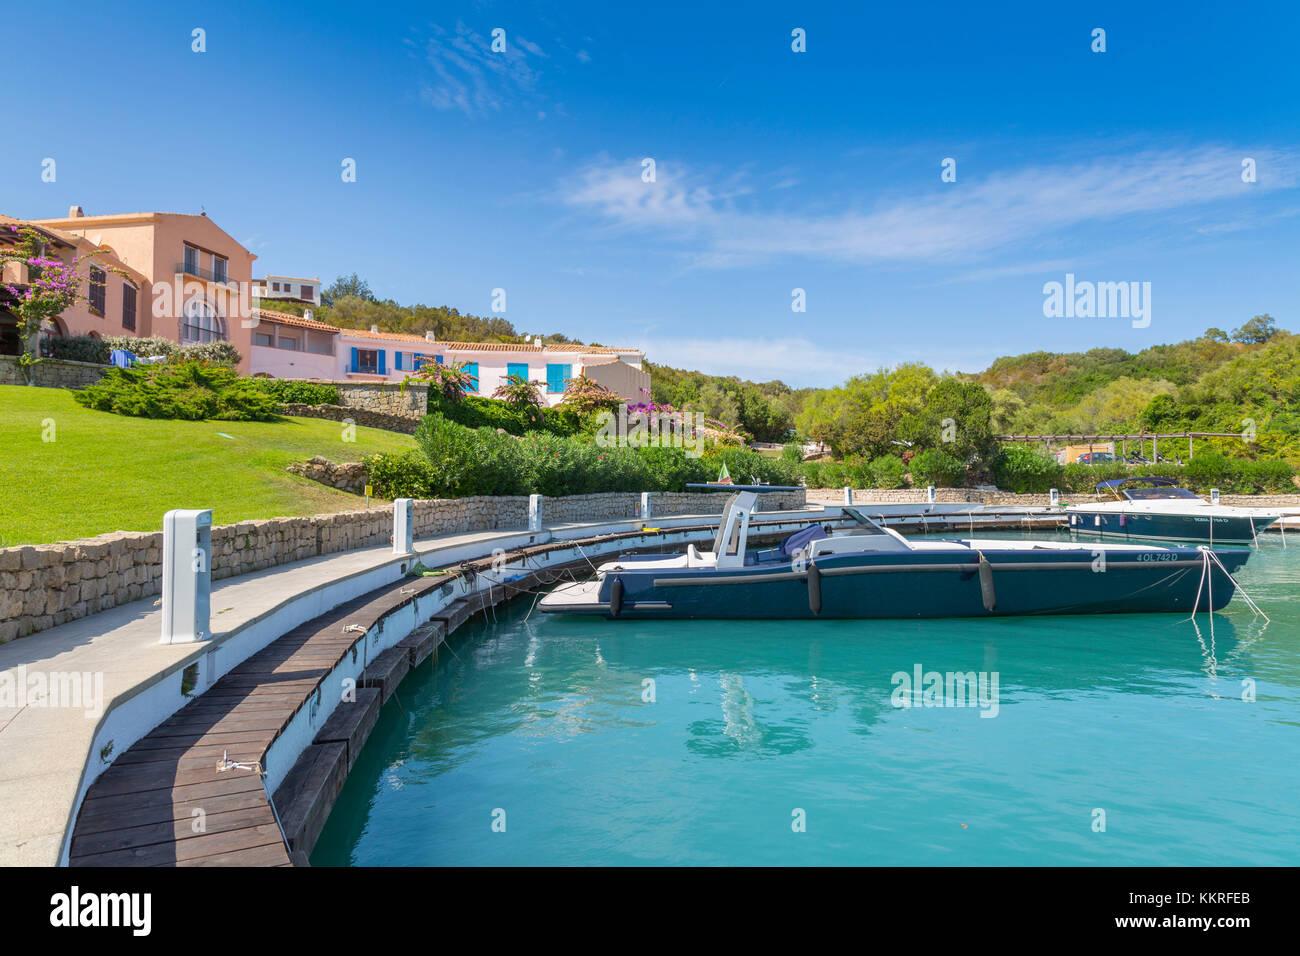 Marina di Porto Oro boathouse, Marinella (Olbia), Olbia-Tempio province, Sardinia district, Italy - Stock Image